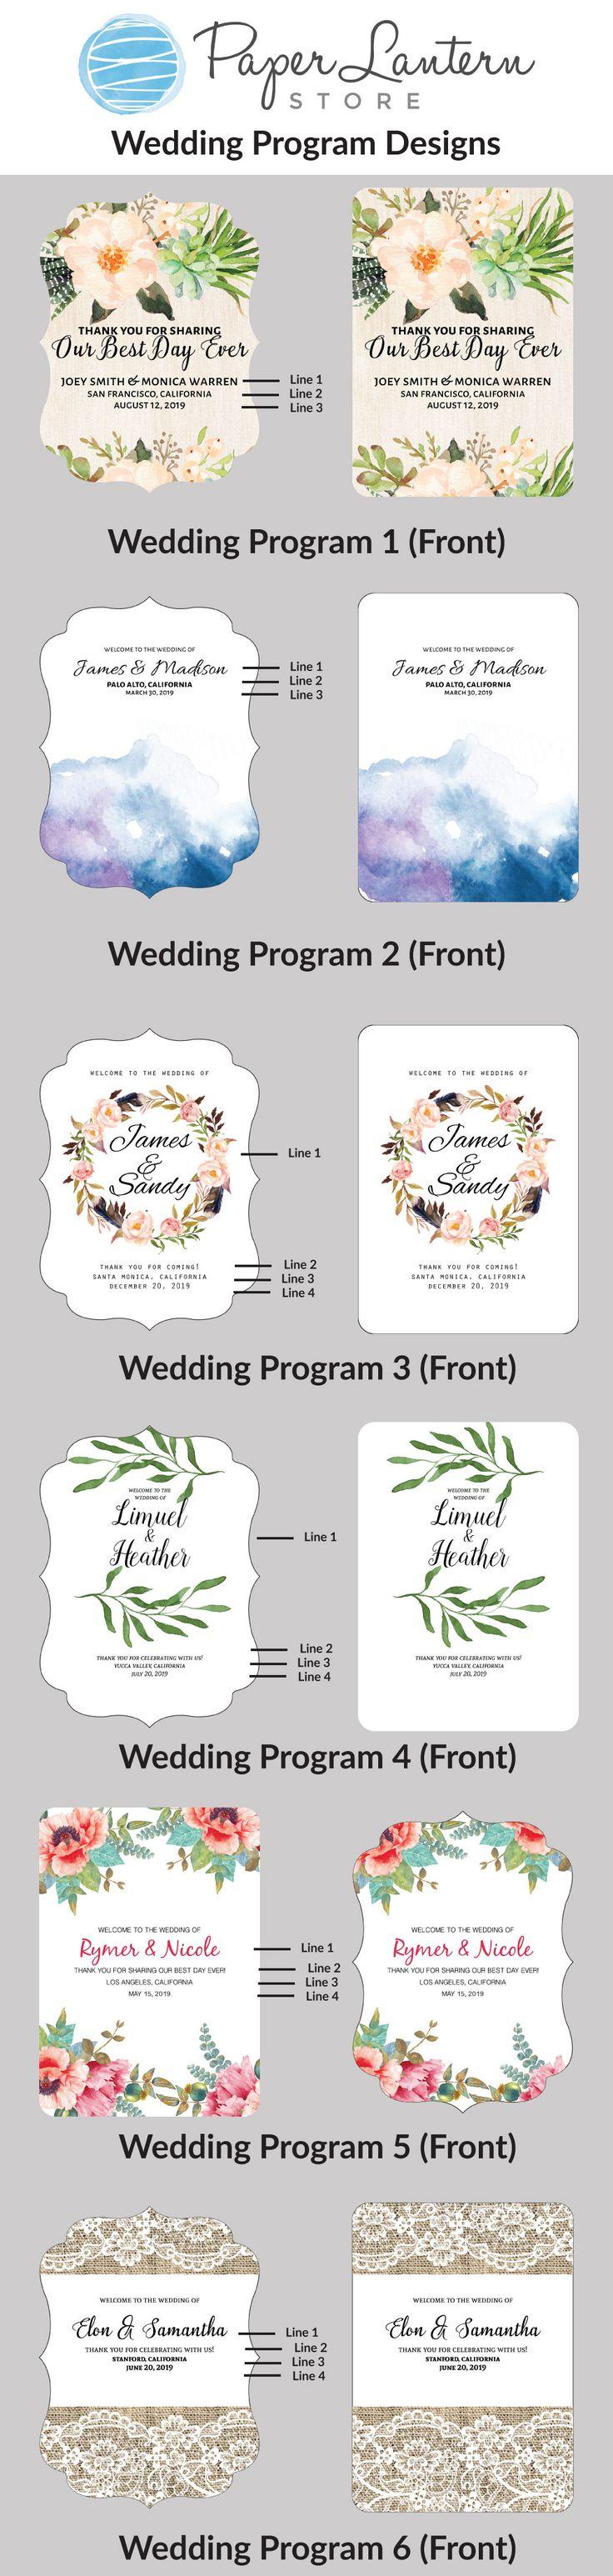 Famous Backyard Wedding Favors Ornament - The Wedding Ideas ...